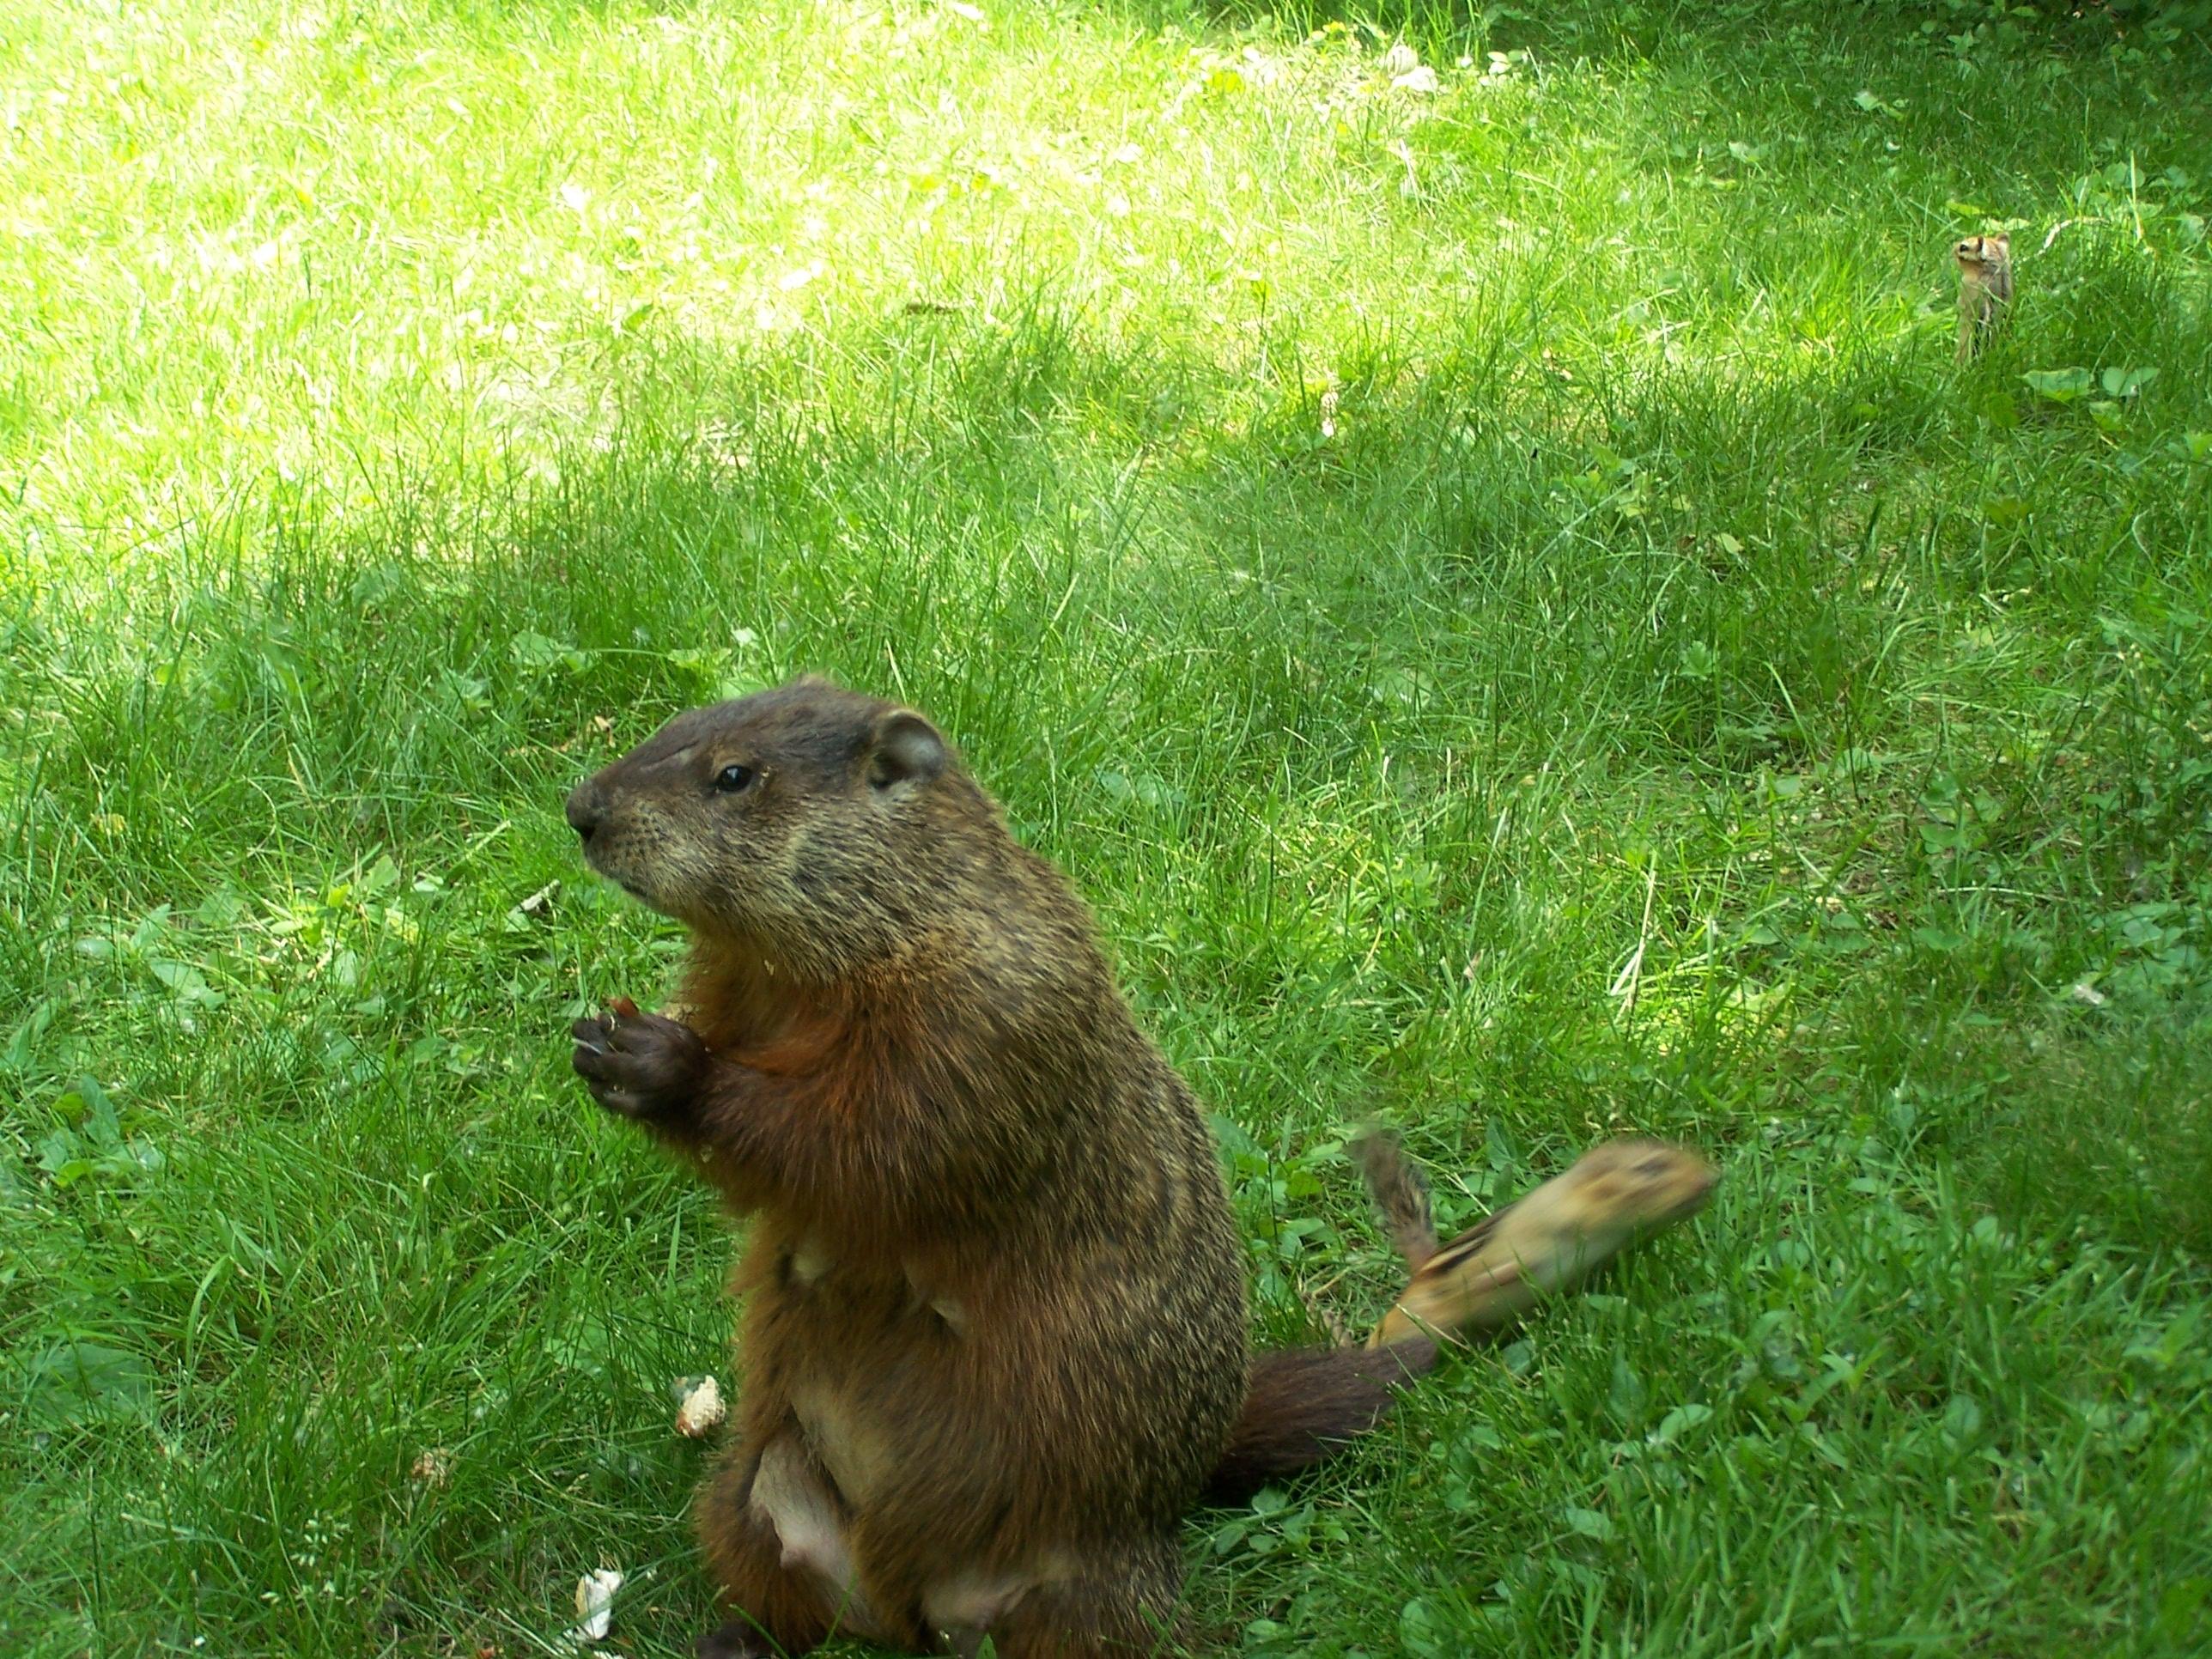 File:Groundhog & Chip-pose.jpg